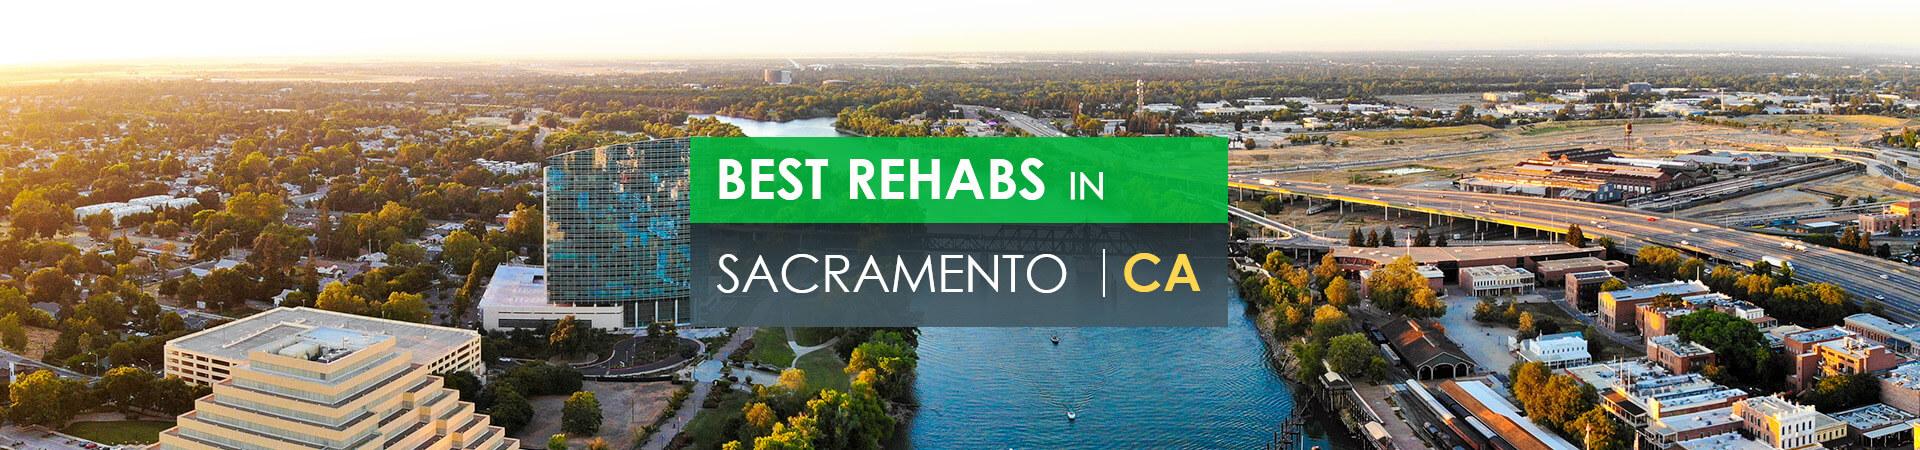 Best rehabs in Sacramento, CA